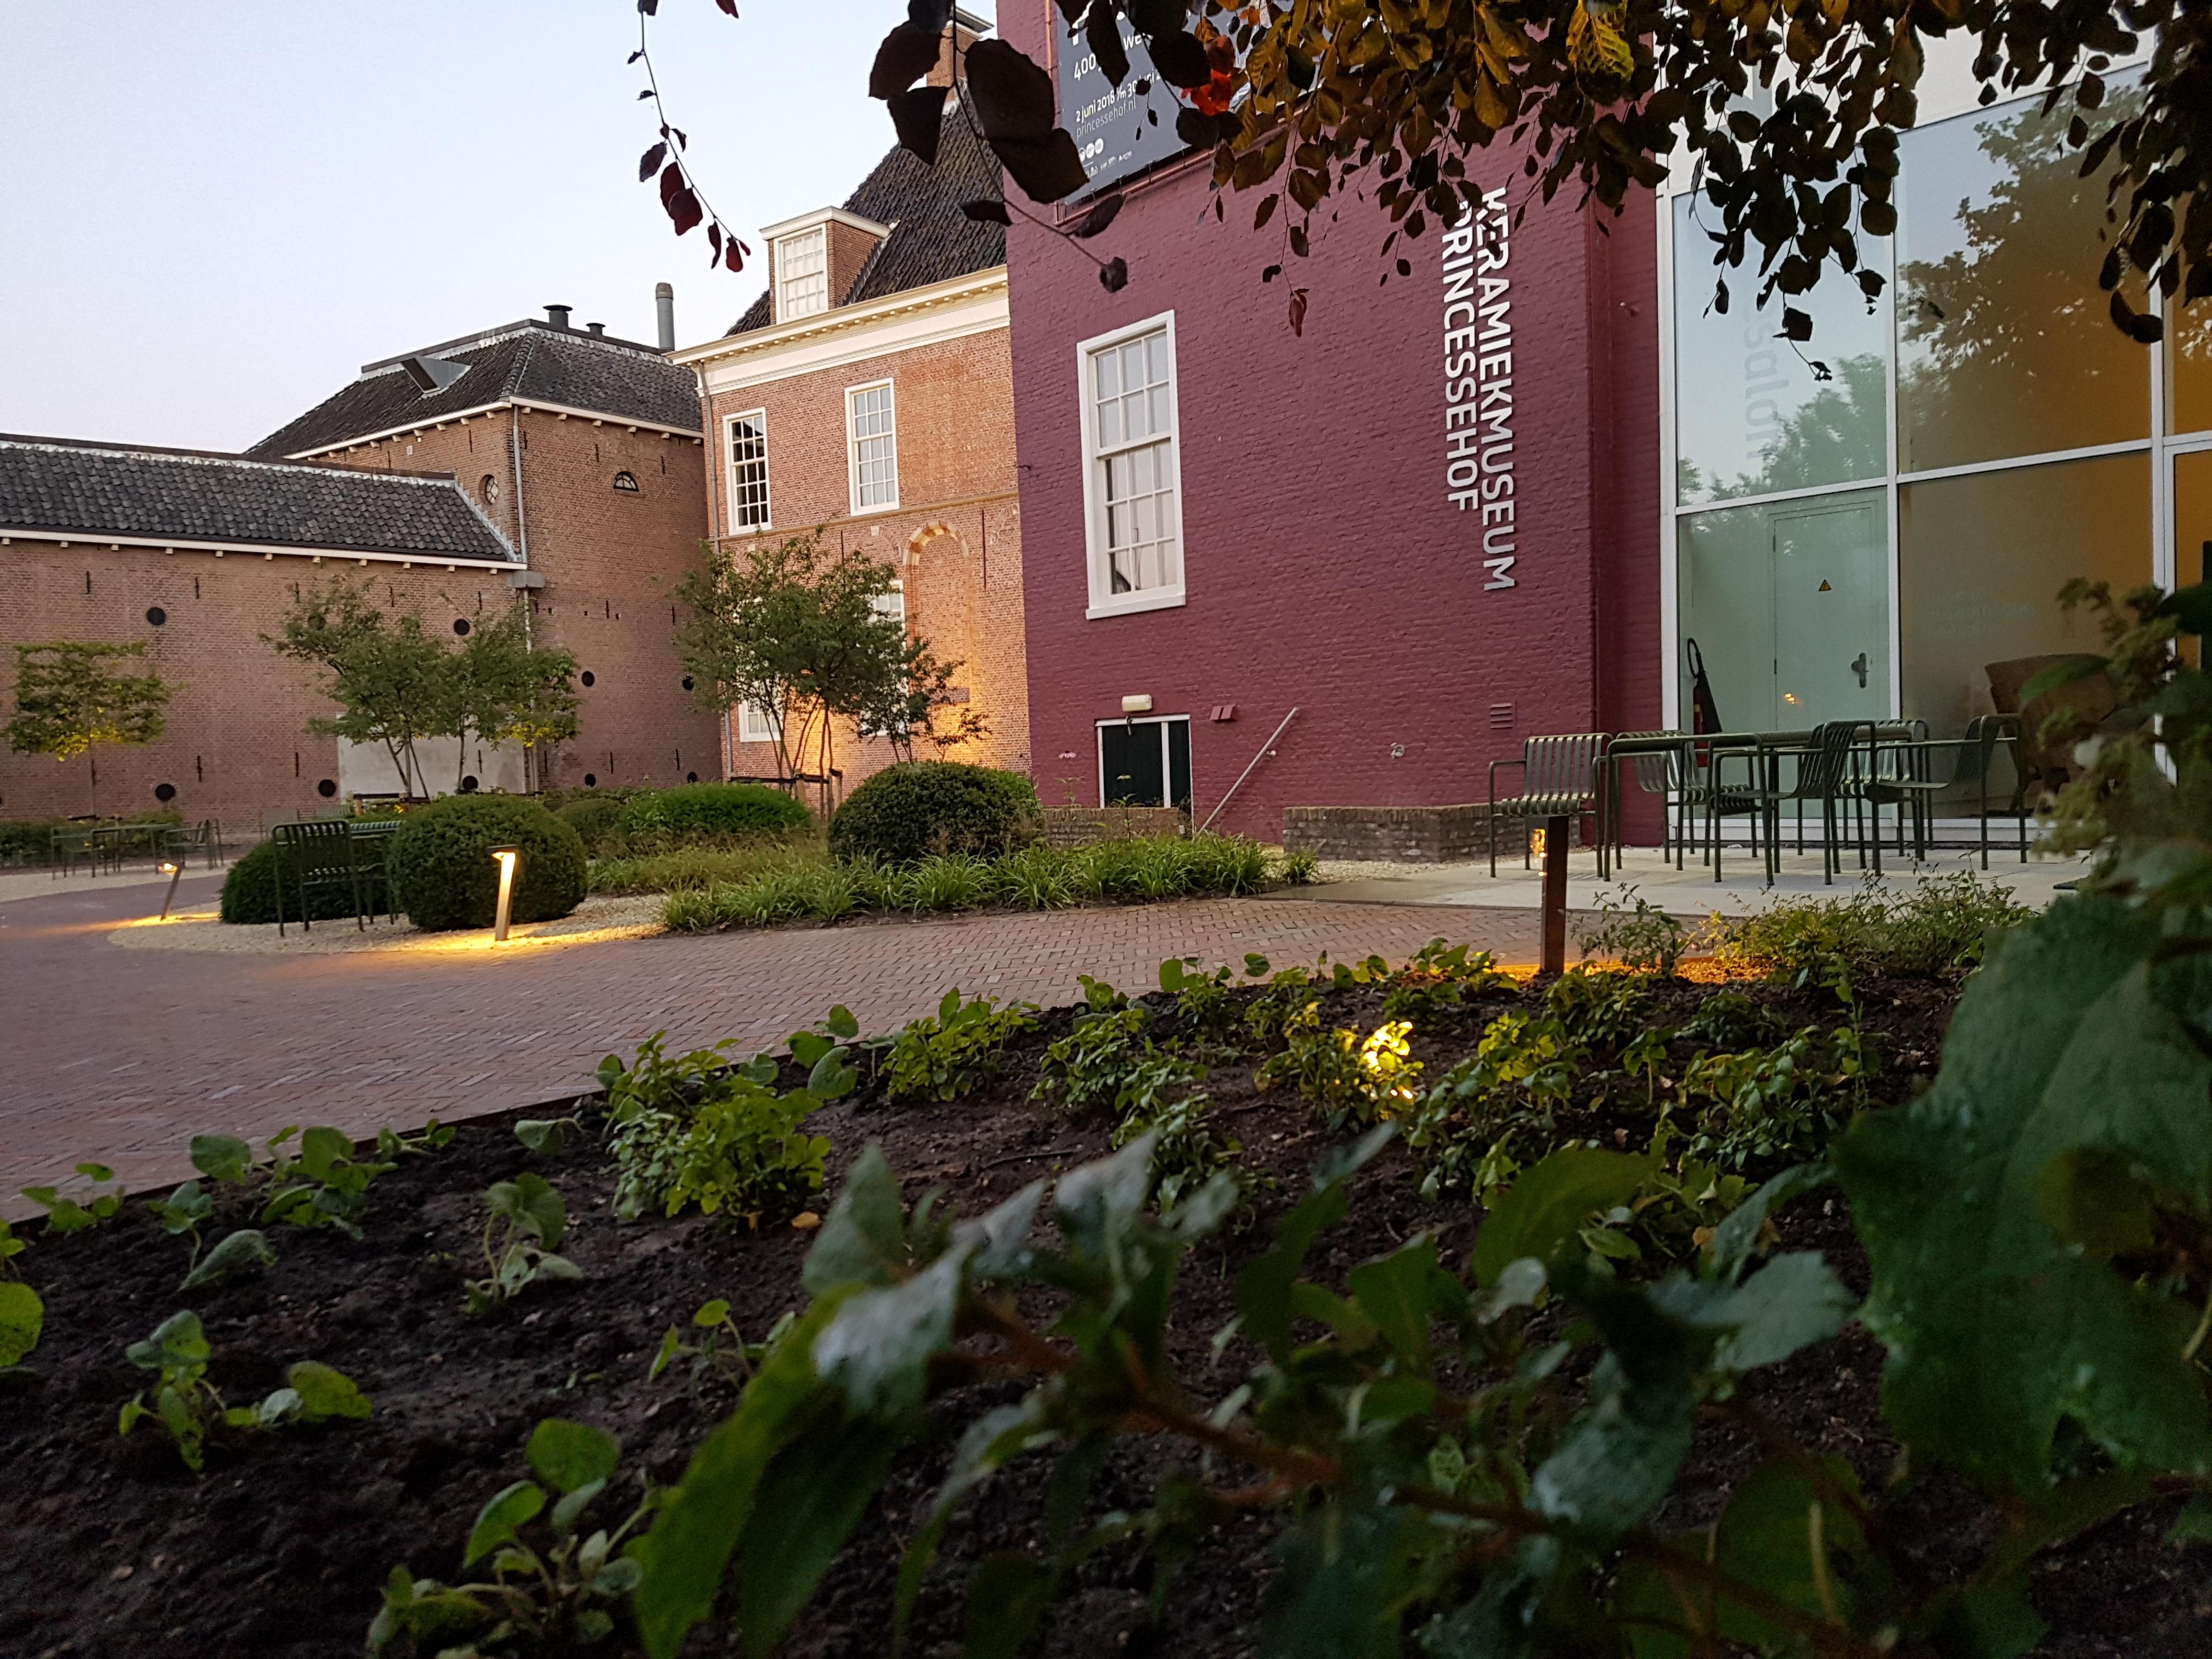 Keramiekmuseum Princessehof Te Leeuwarden.